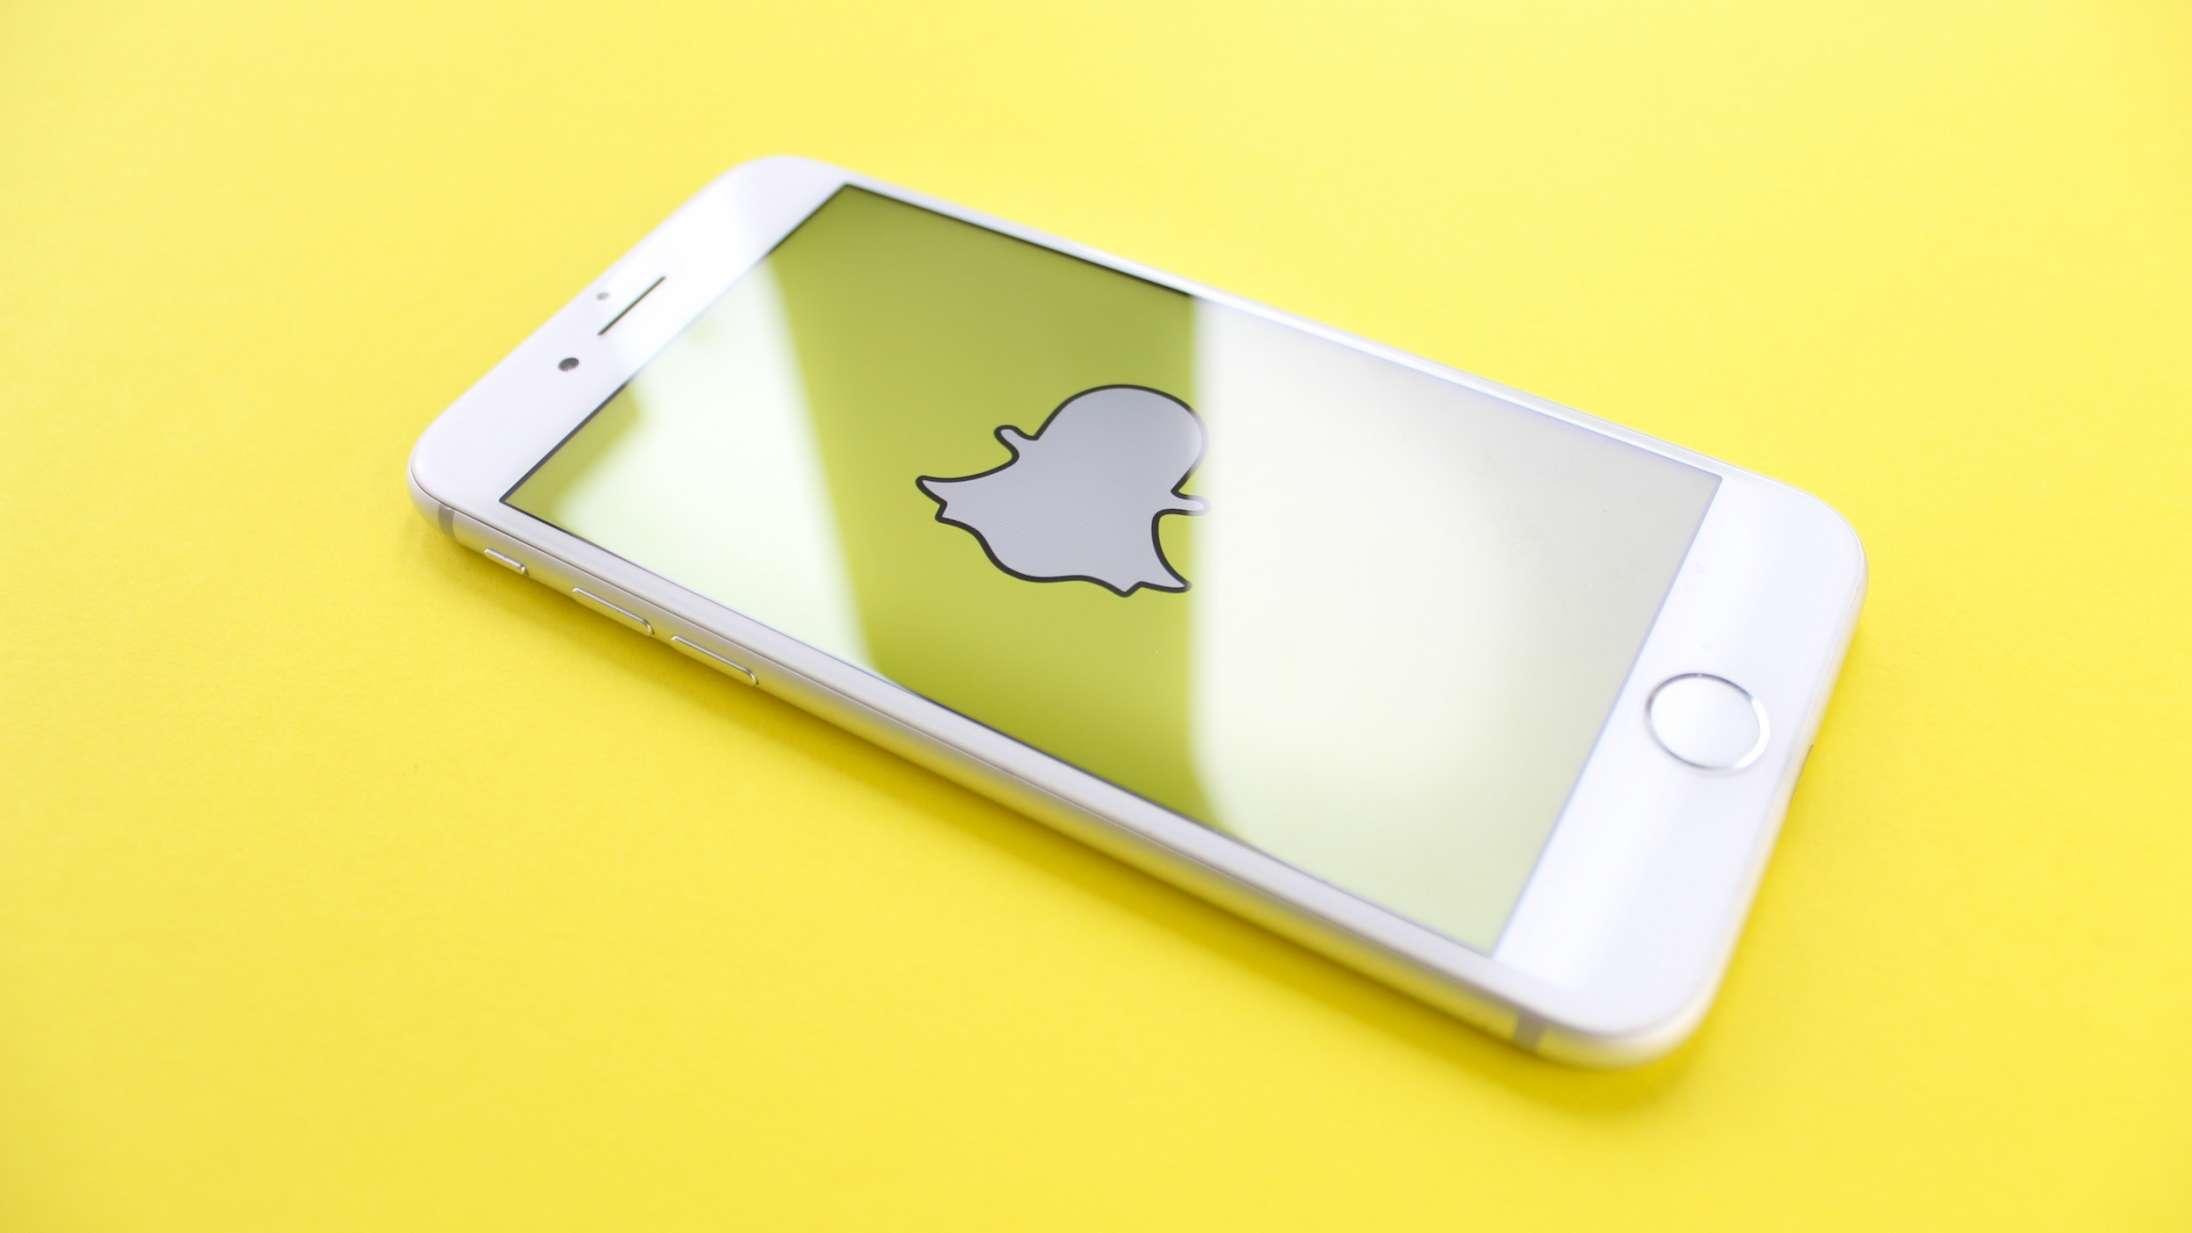 Snapchat tager kampen op mod TikTok med ny musik-funktion